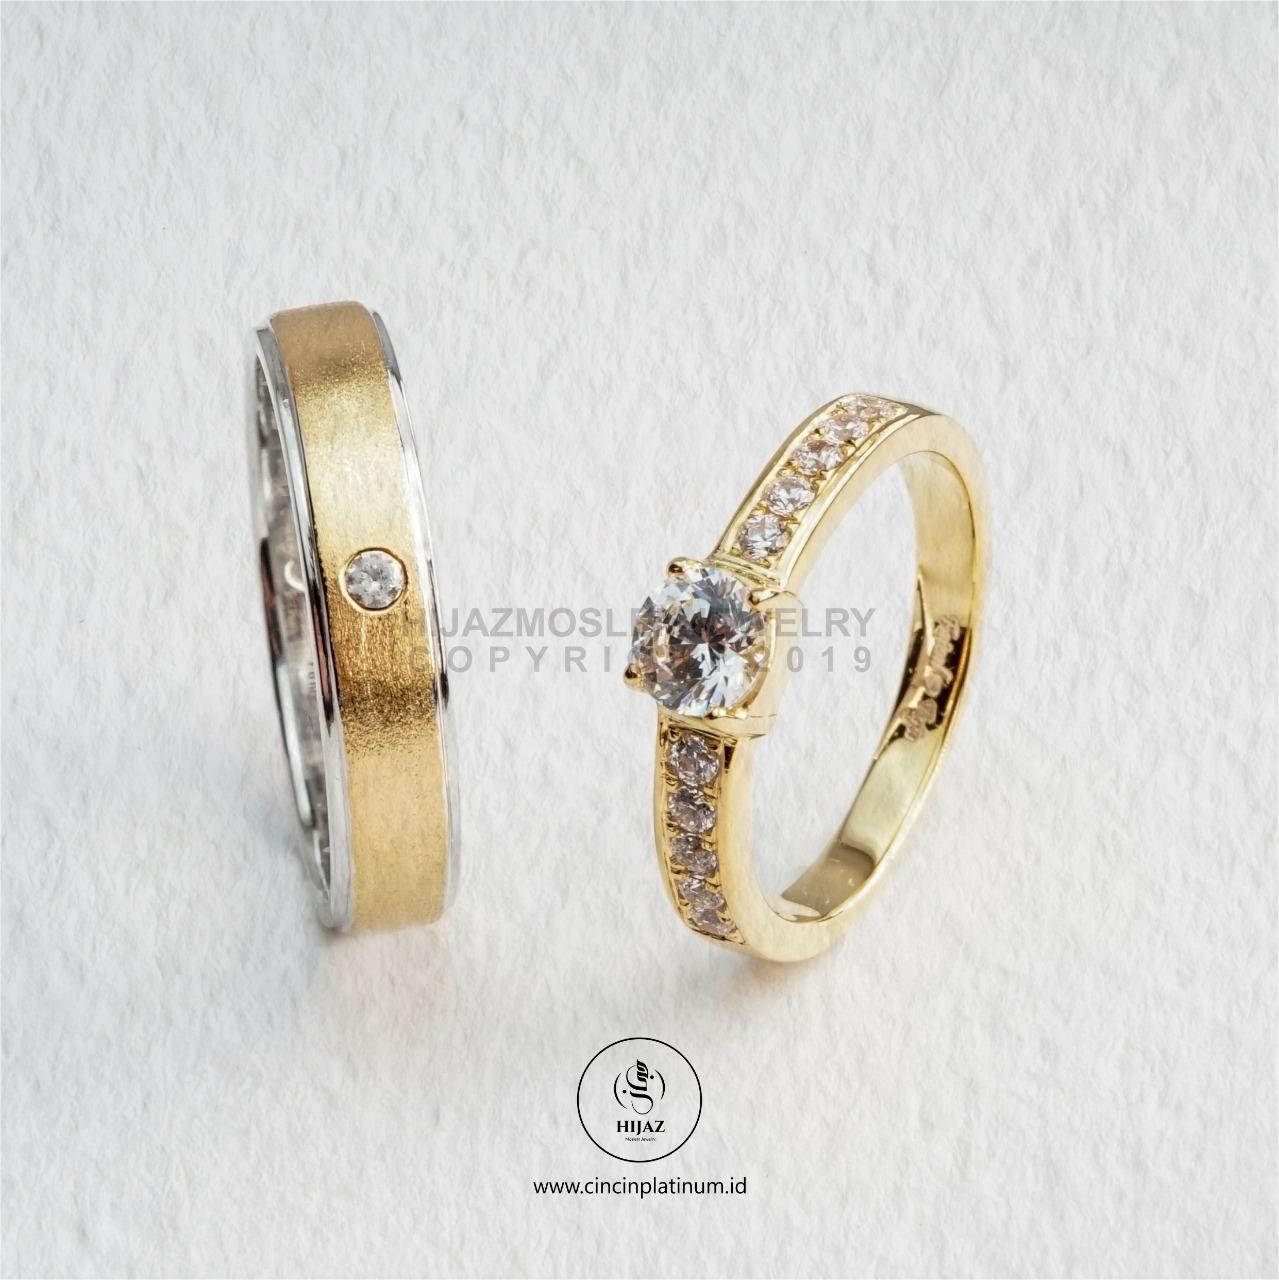 Cincin Kawin Tunangan Emas Palladium Emas Kuning PD0169YG